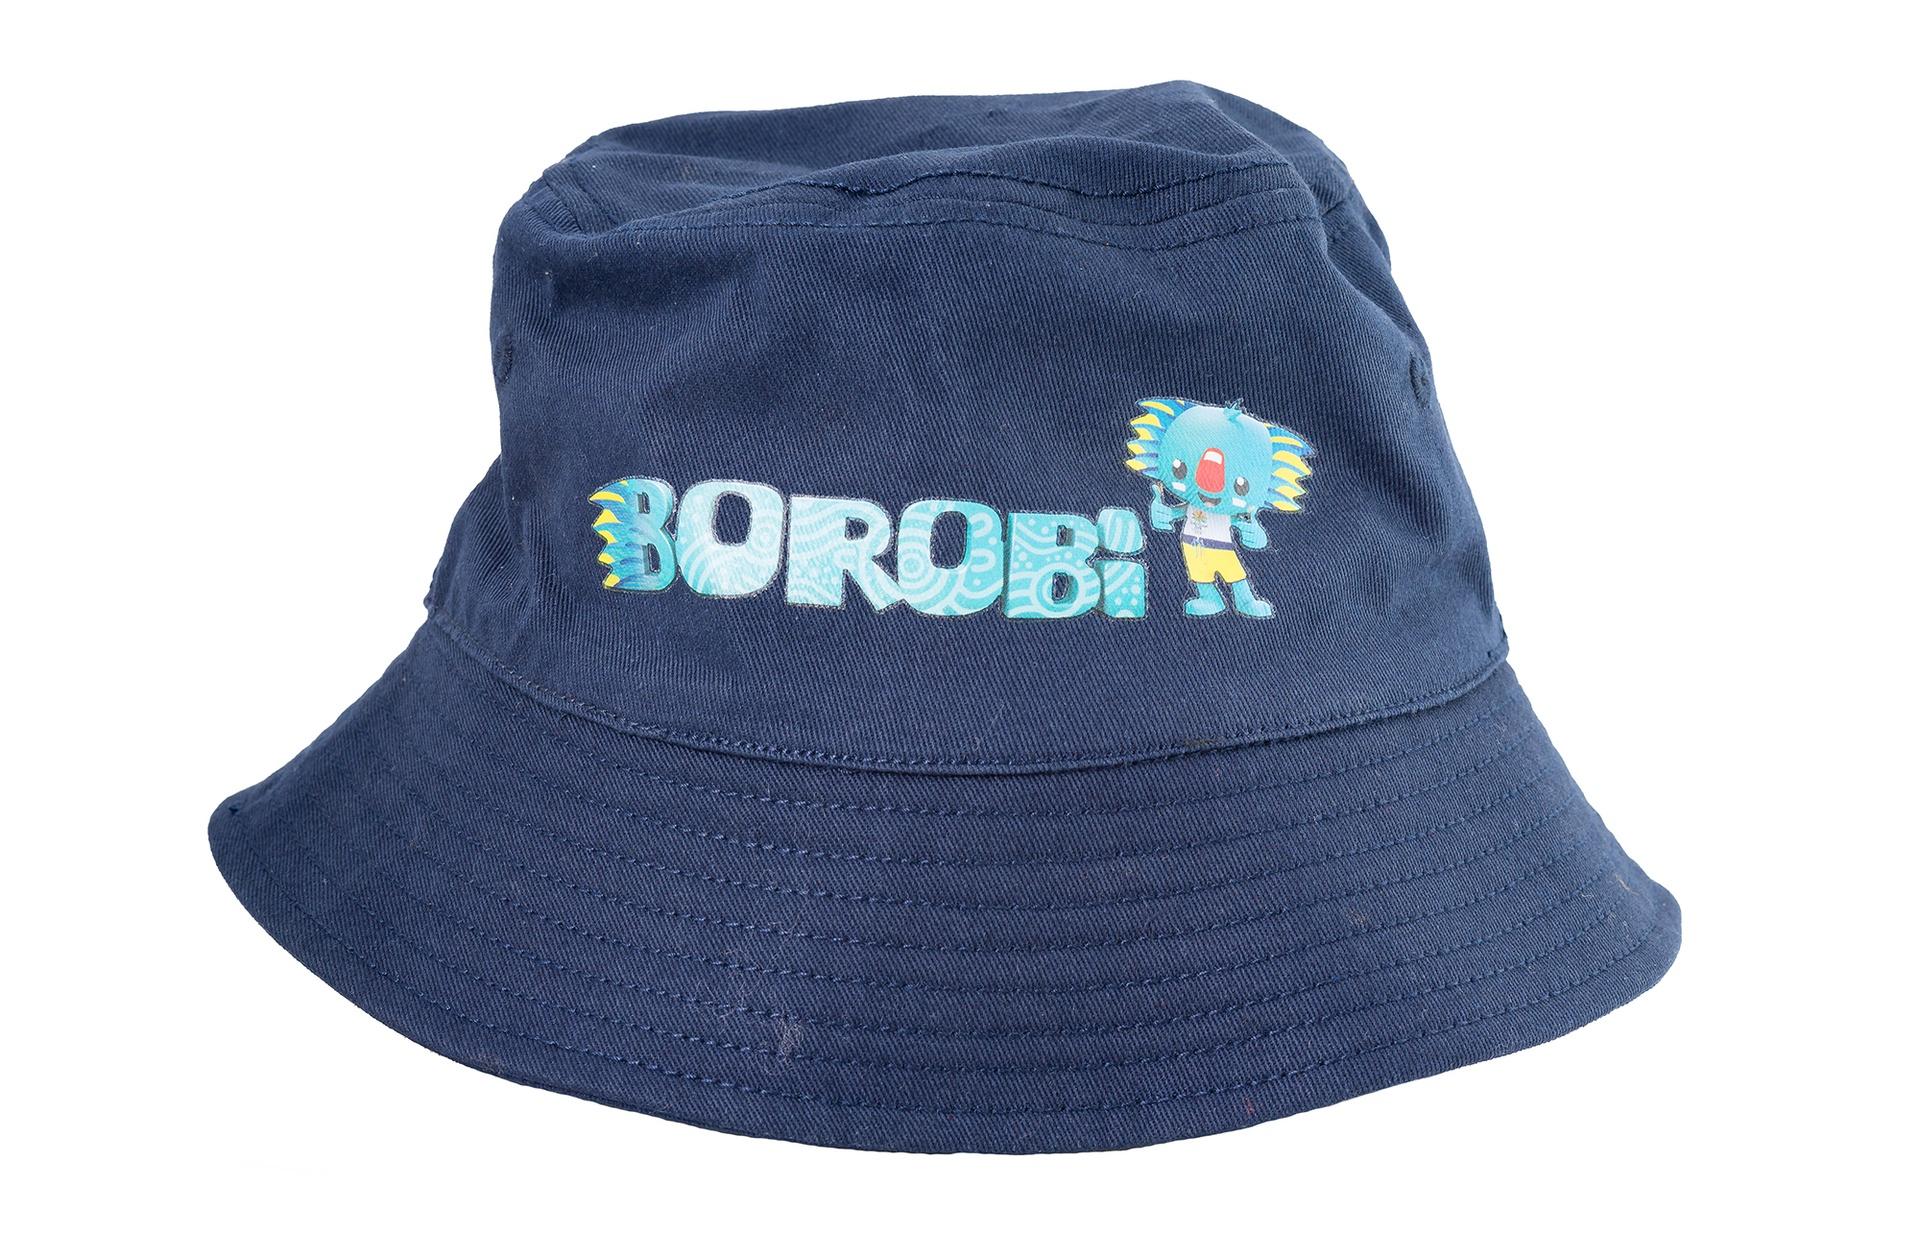 Borobi Mascot Bucket Hat Image